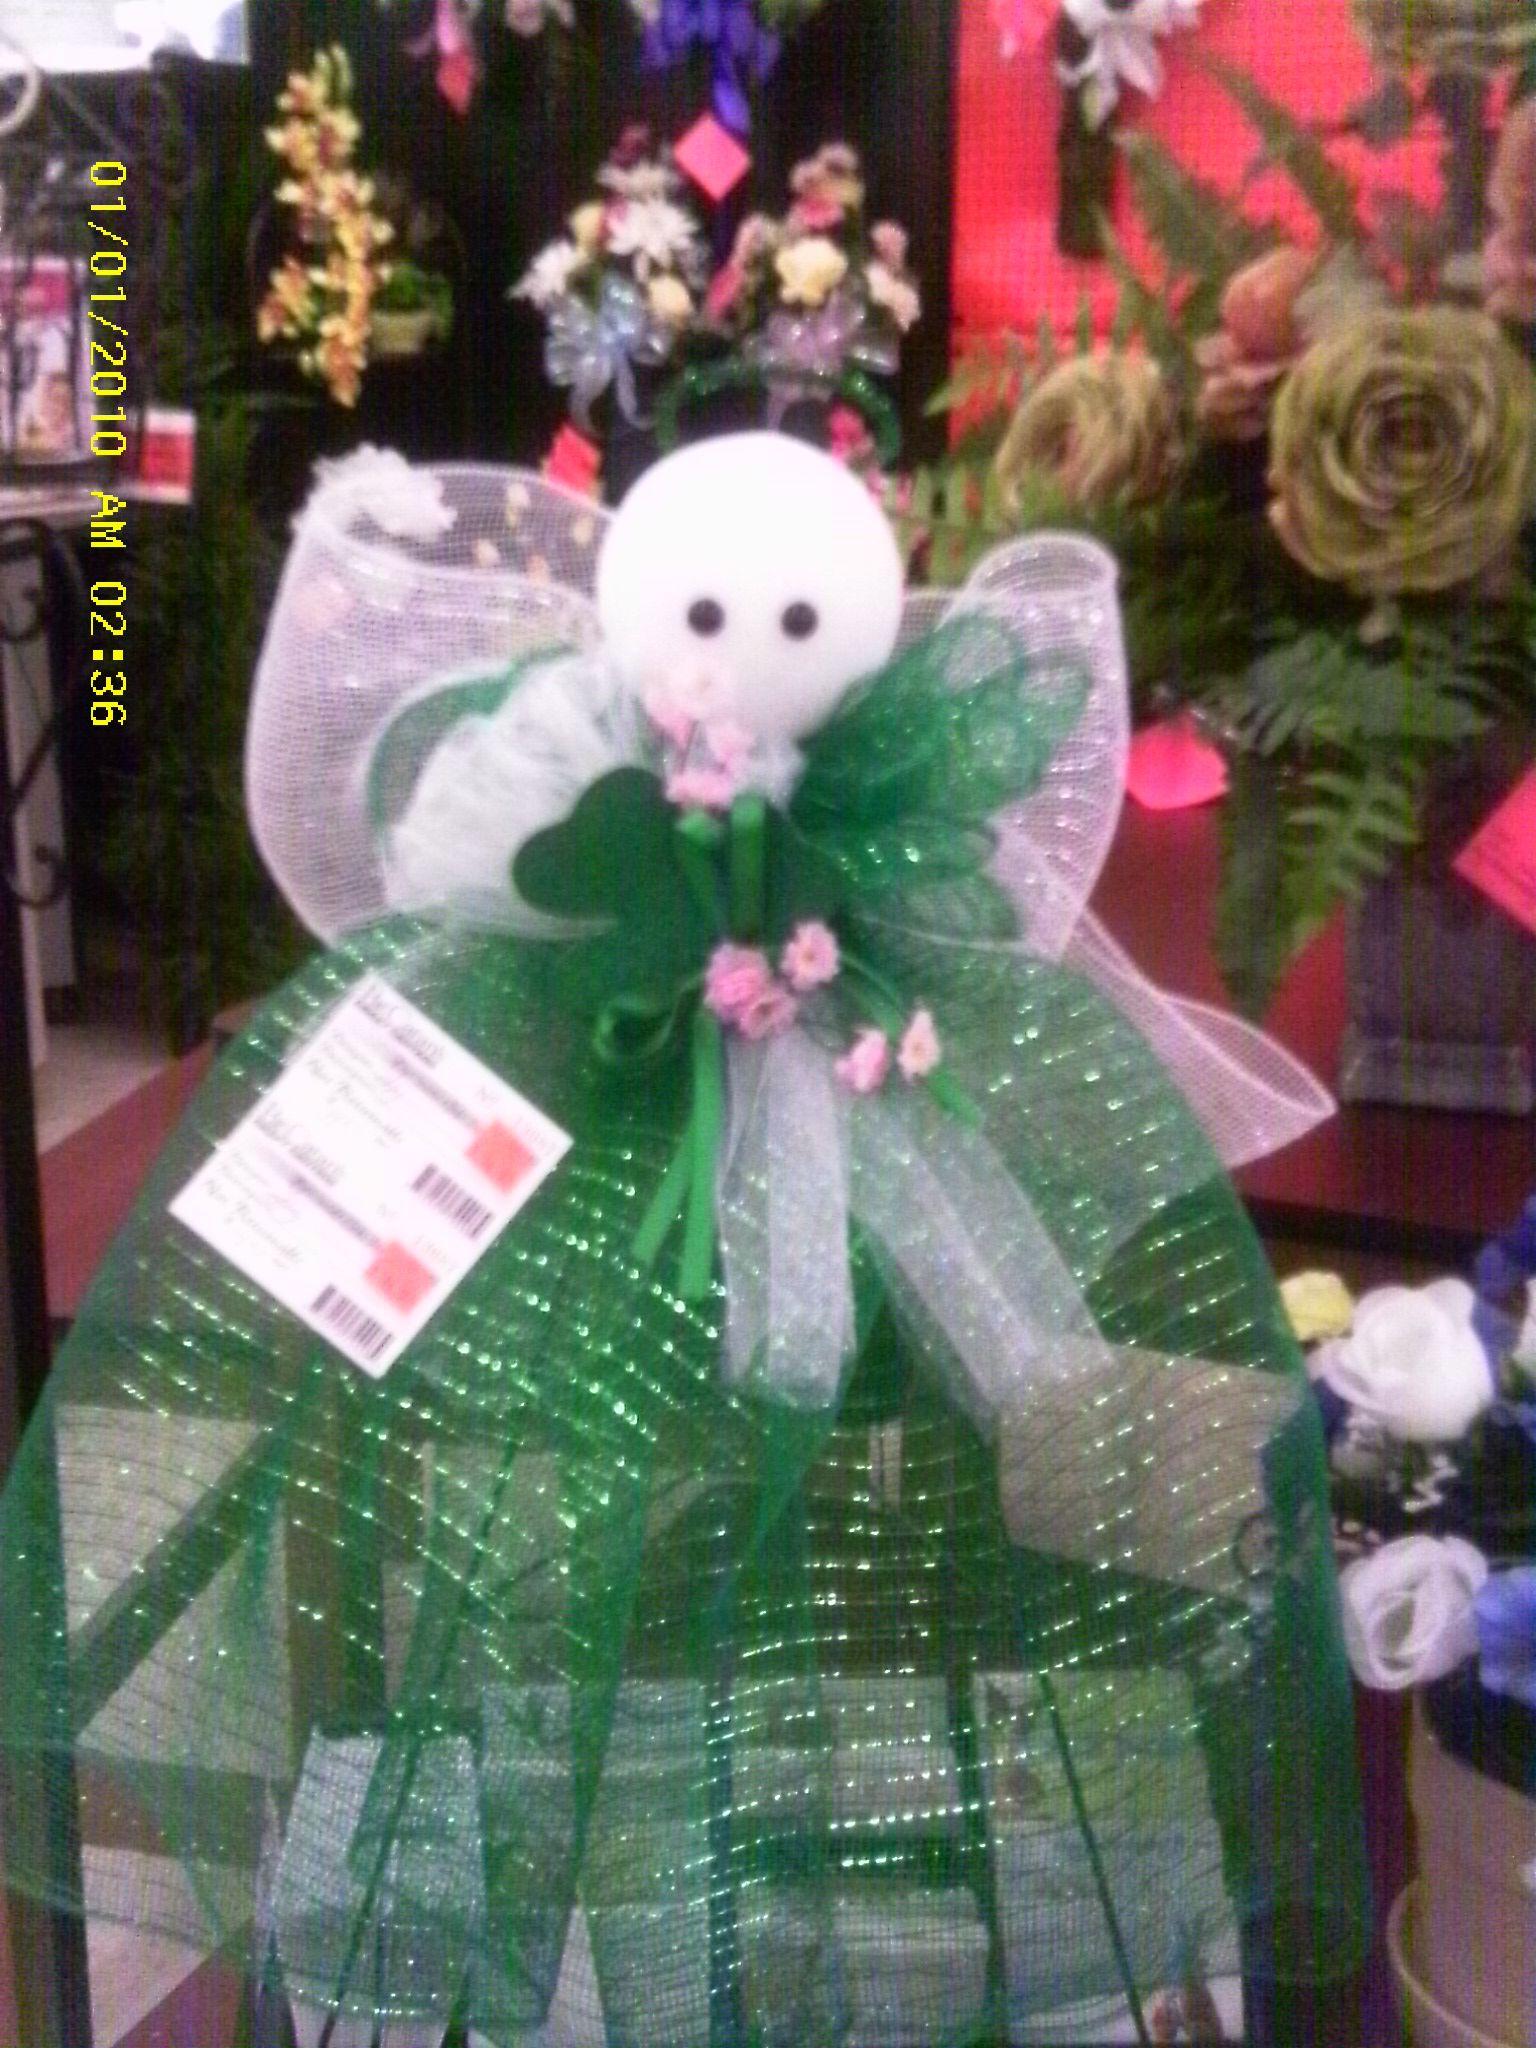 deco mesh st patrick angel craft ideas pinterest angel wreaths and craft. Black Bedroom Furniture Sets. Home Design Ideas